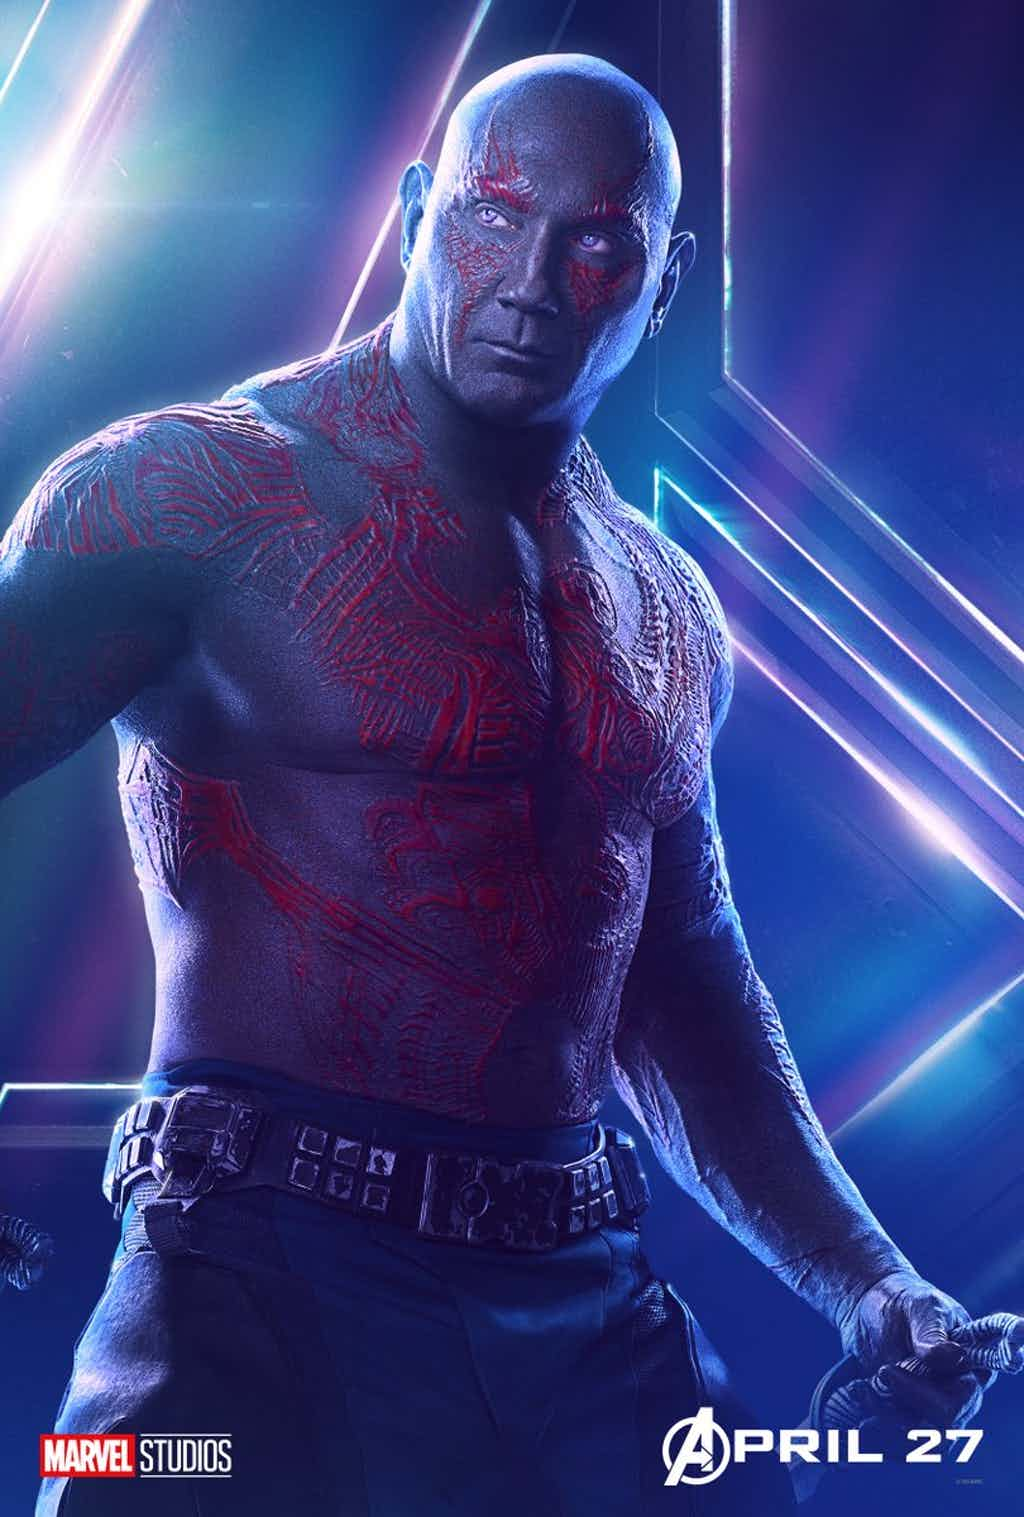 szmk_marvel_infinity_war_vegtelen_haboru_bosszuallok_avengers_ironman_hulk_thor_captainamaerica_guardians_galaxy_4.jpg